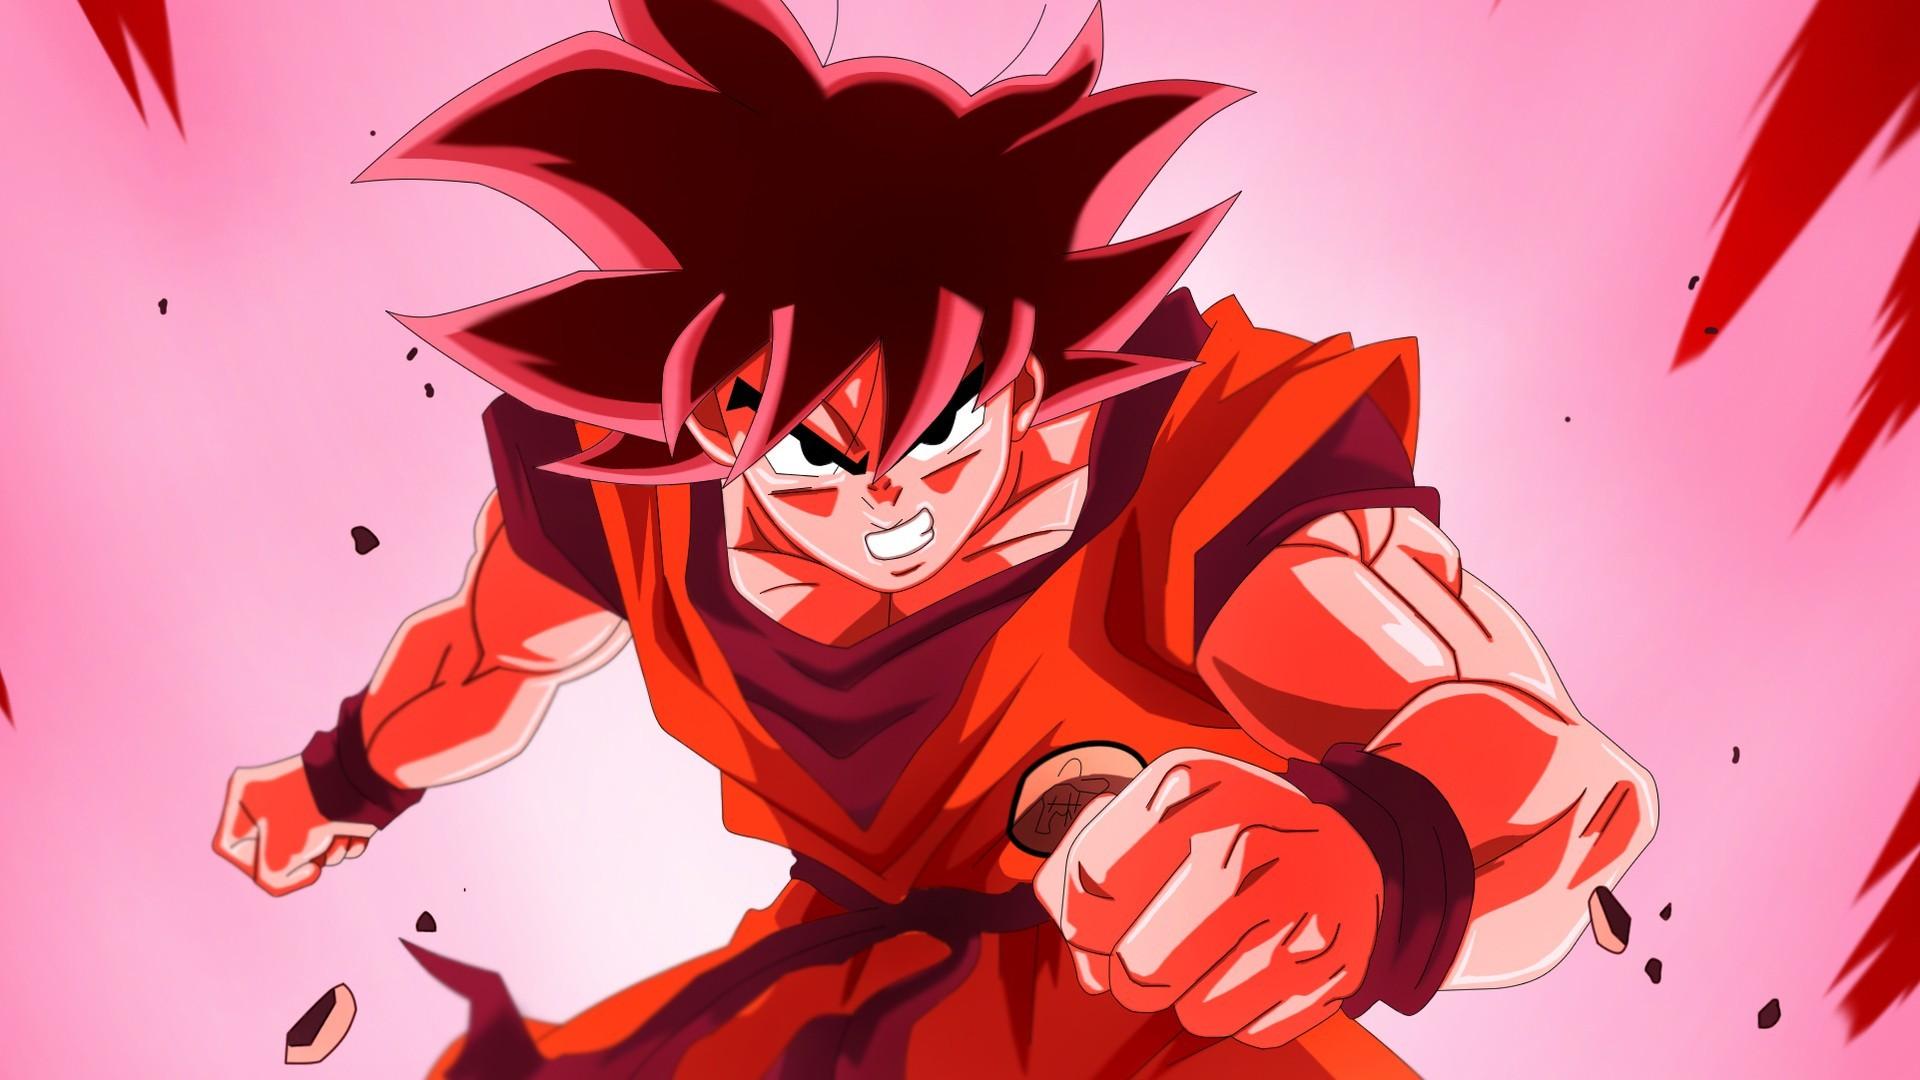 Download the Goku Charging Up Wallpaper, Goku Charging Up iPhone .